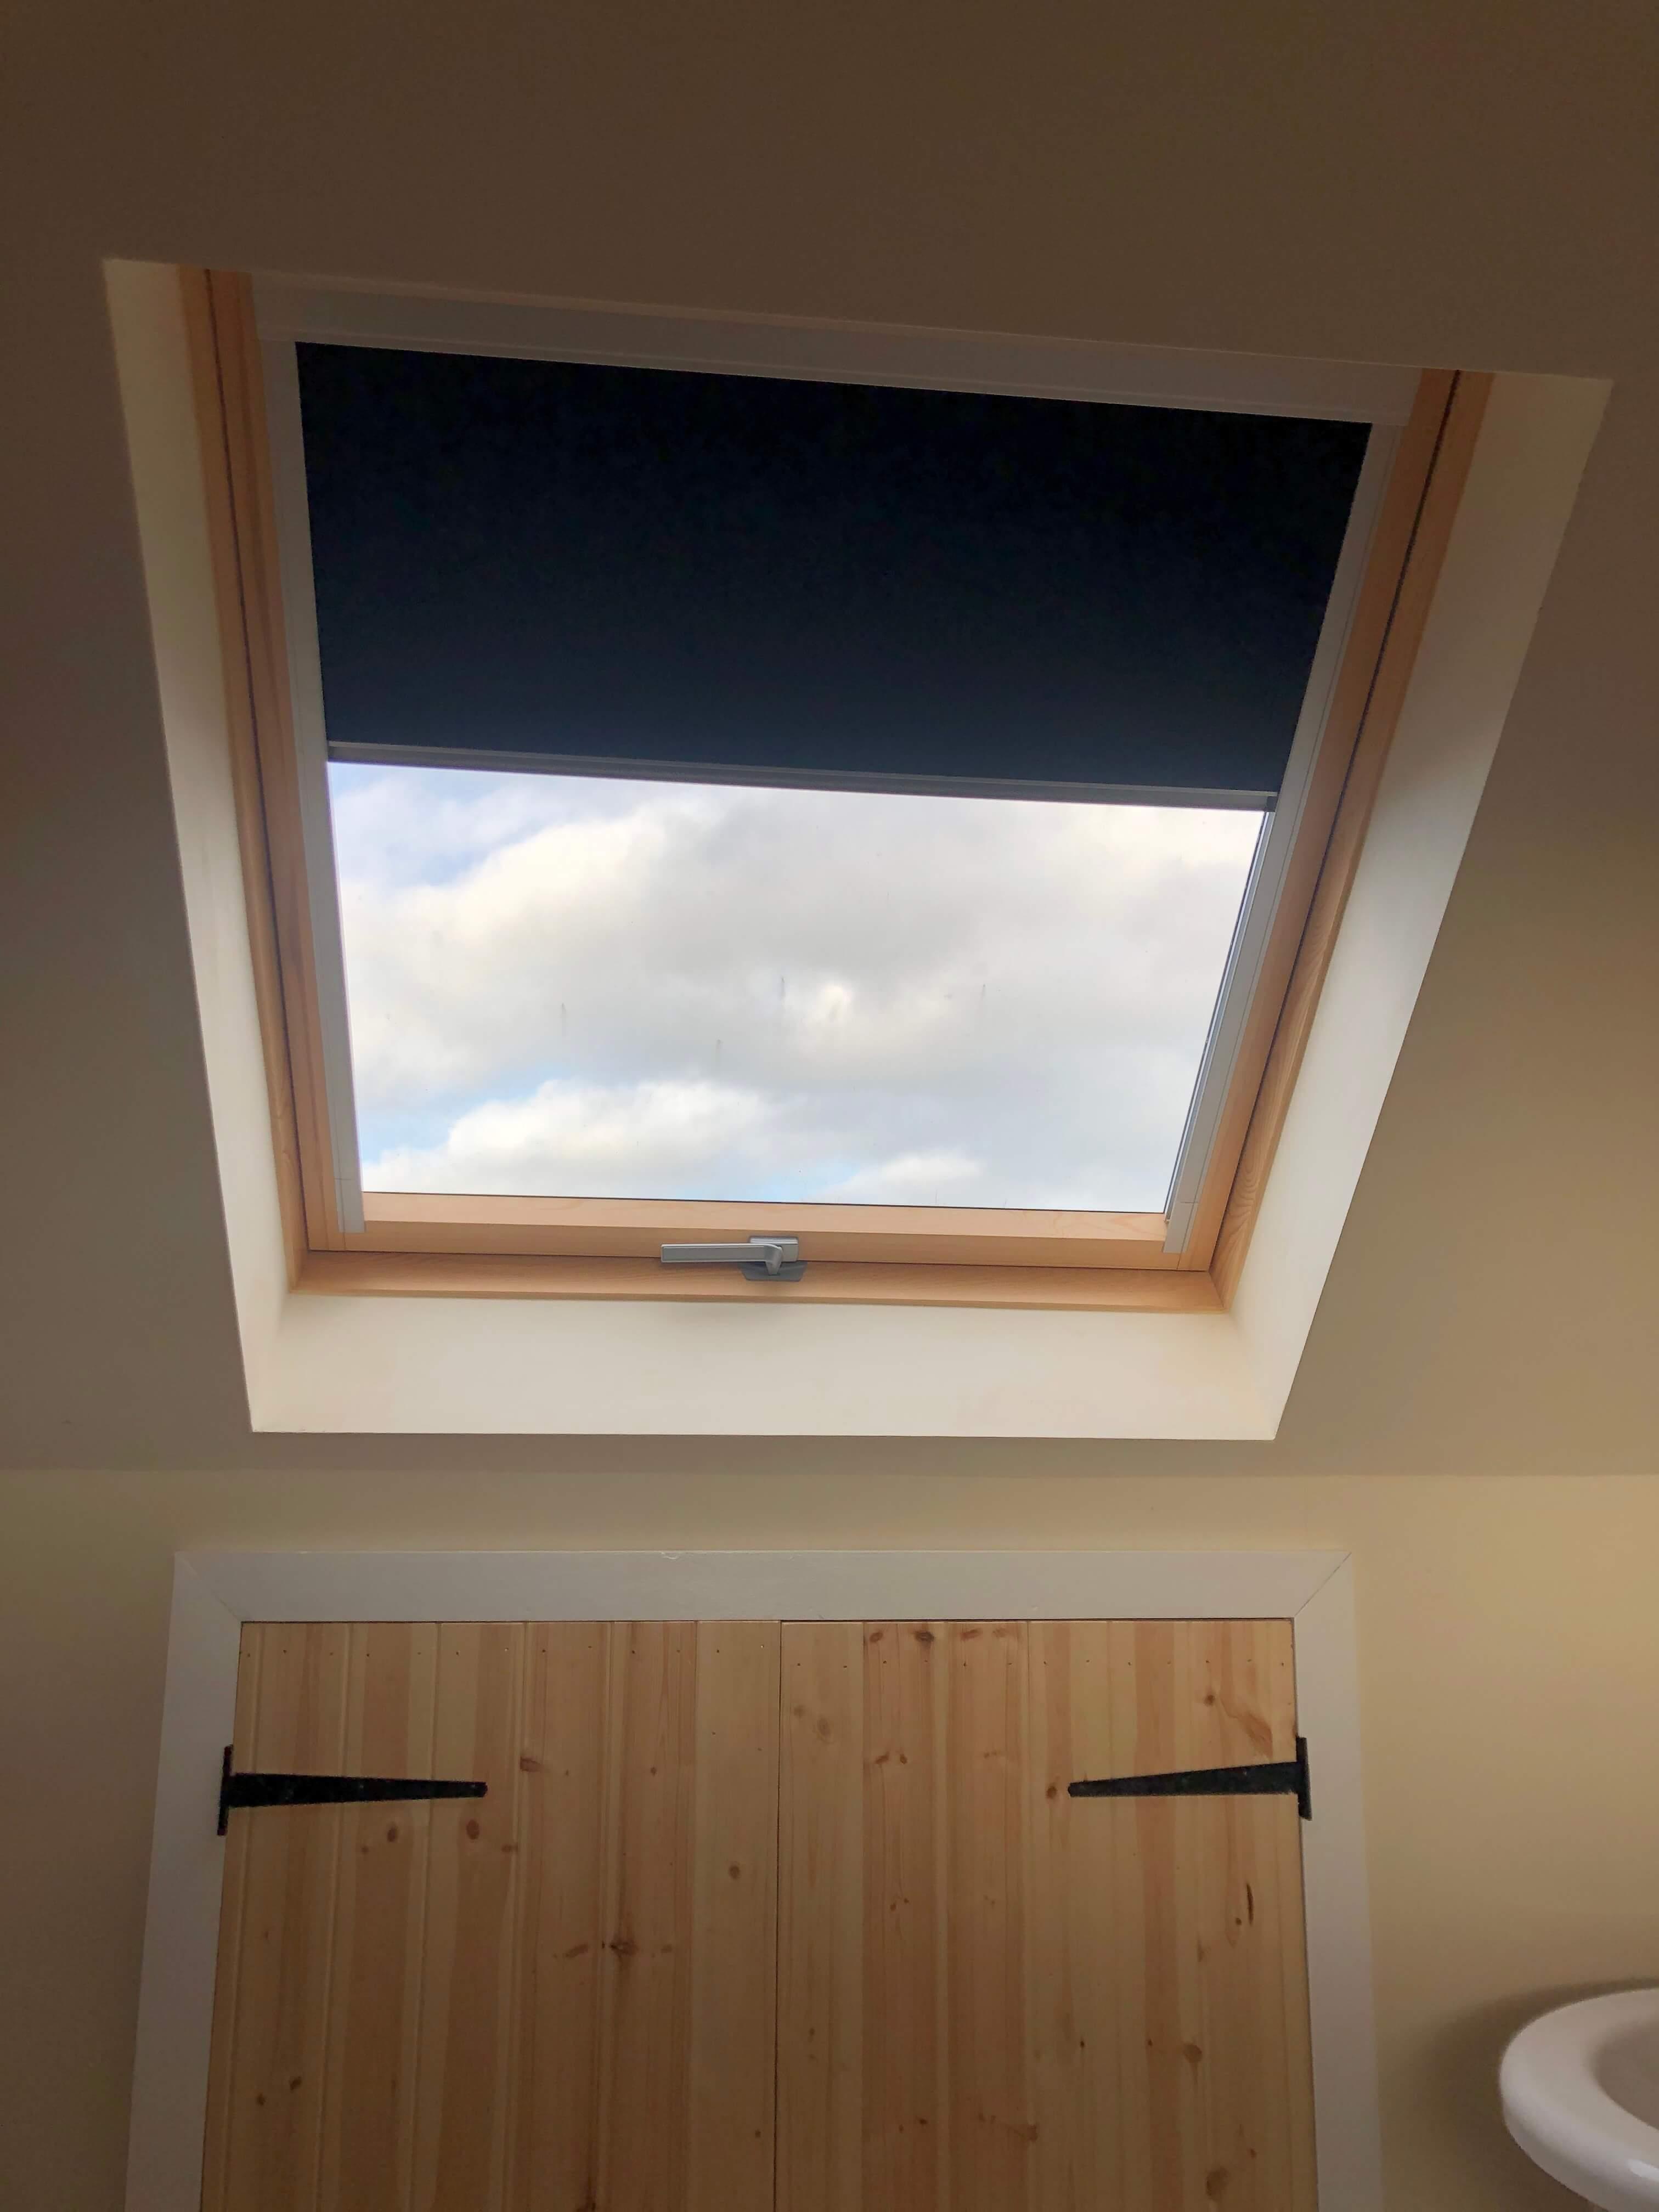 Dakea Ultima™ roof windows and Dakea blackout blinds